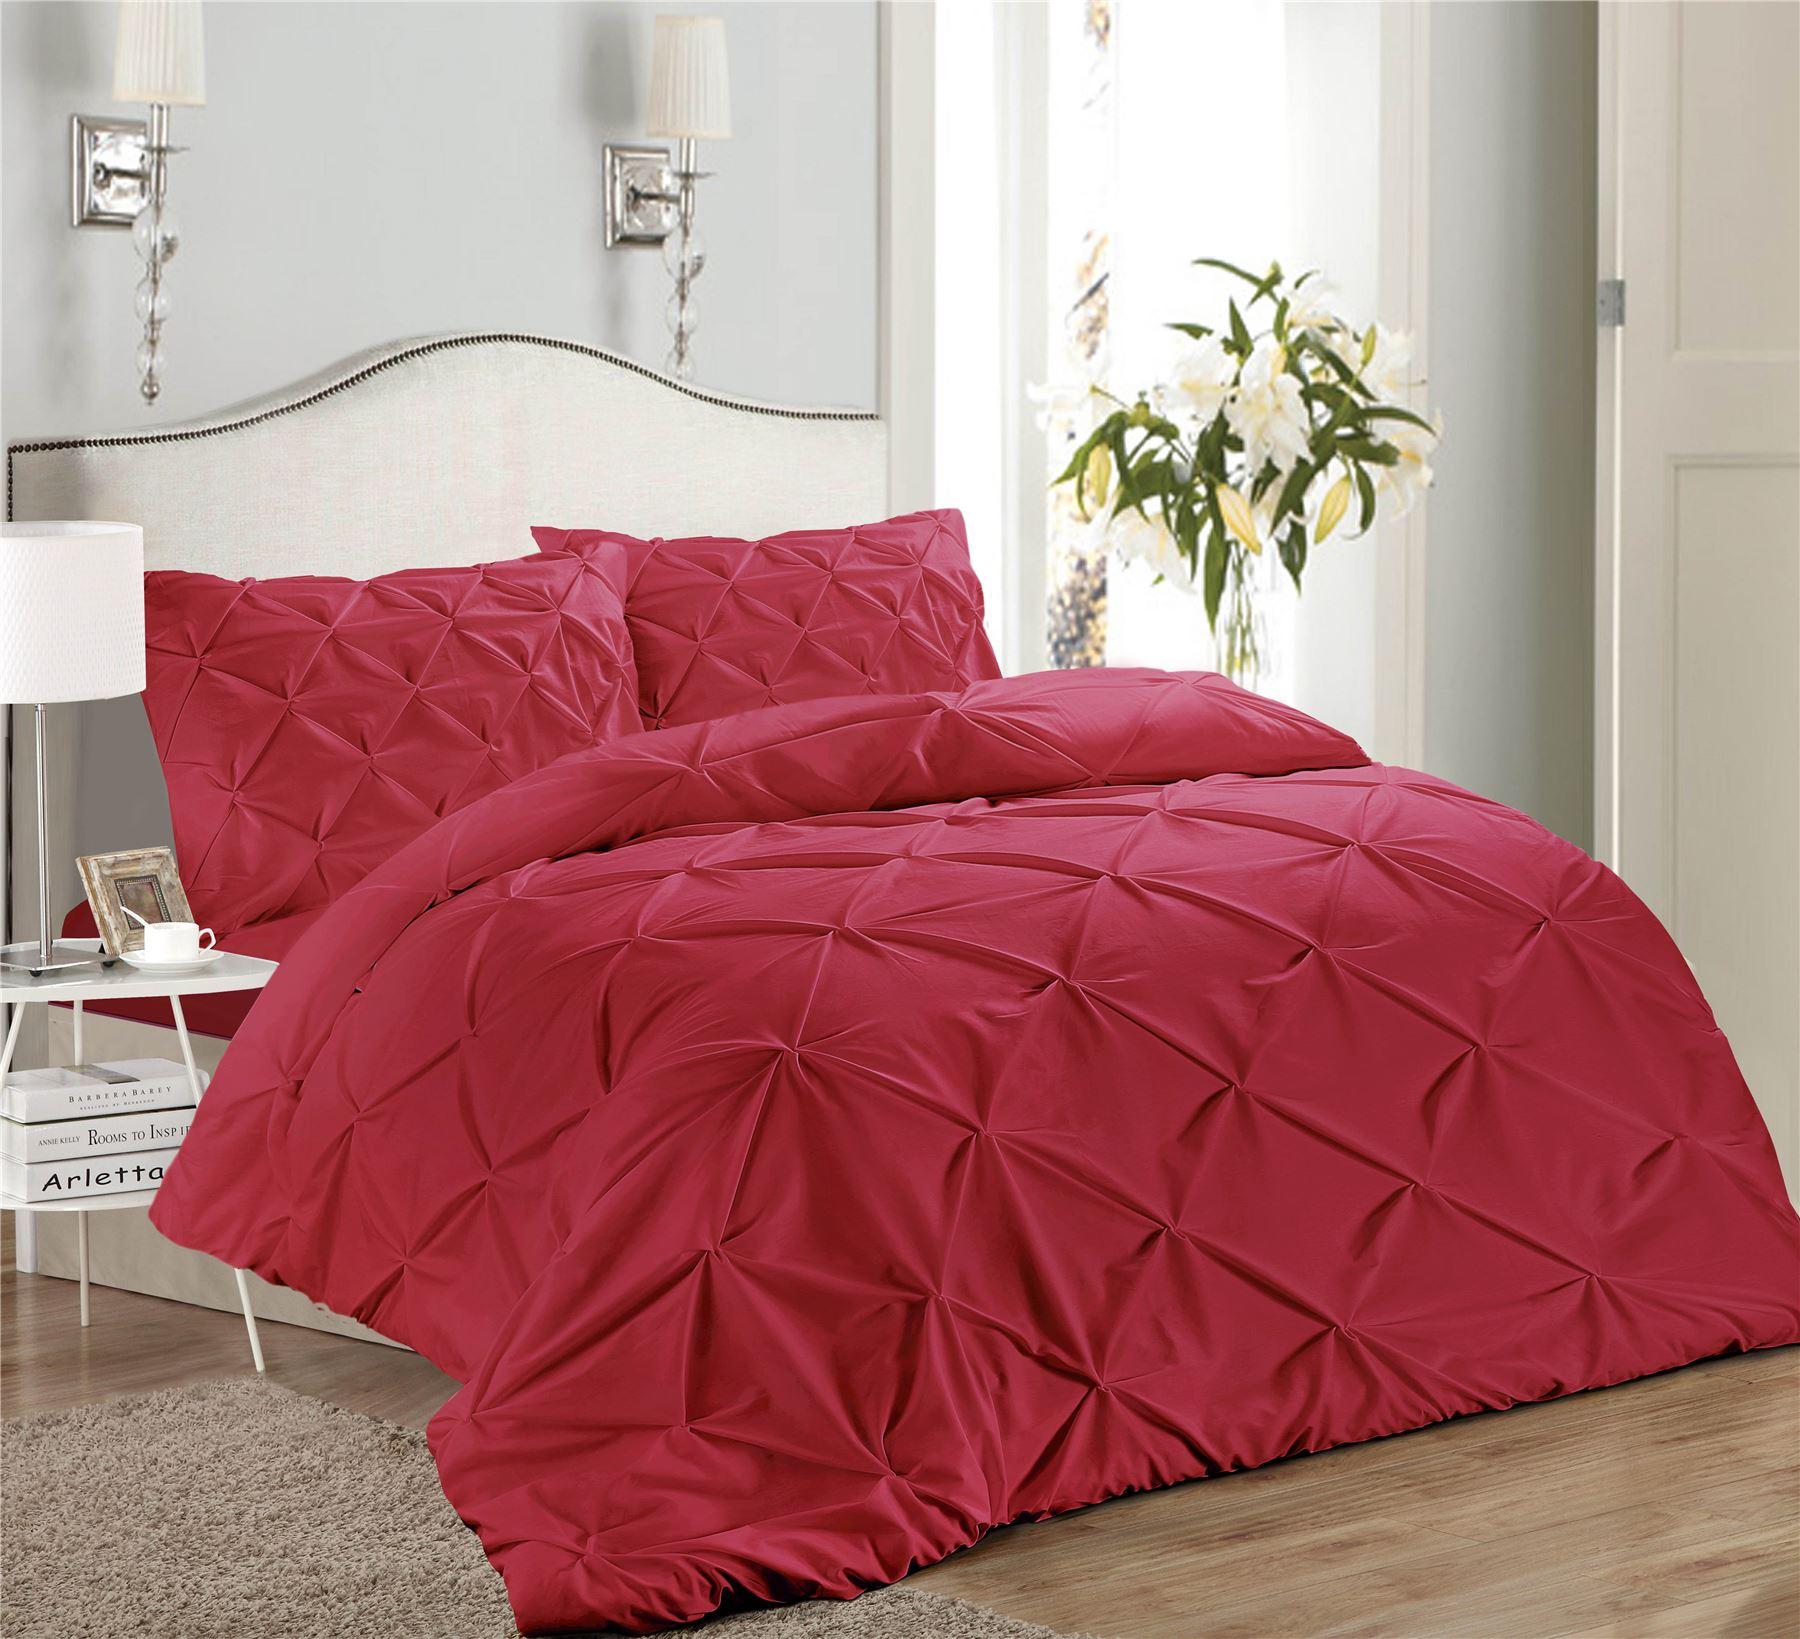 Luxury-Pure-100-Cotton-200-Thread-Pinch-Pleat-Pintuck-Puckering-Duvet-Cover-Set thumbnail 40